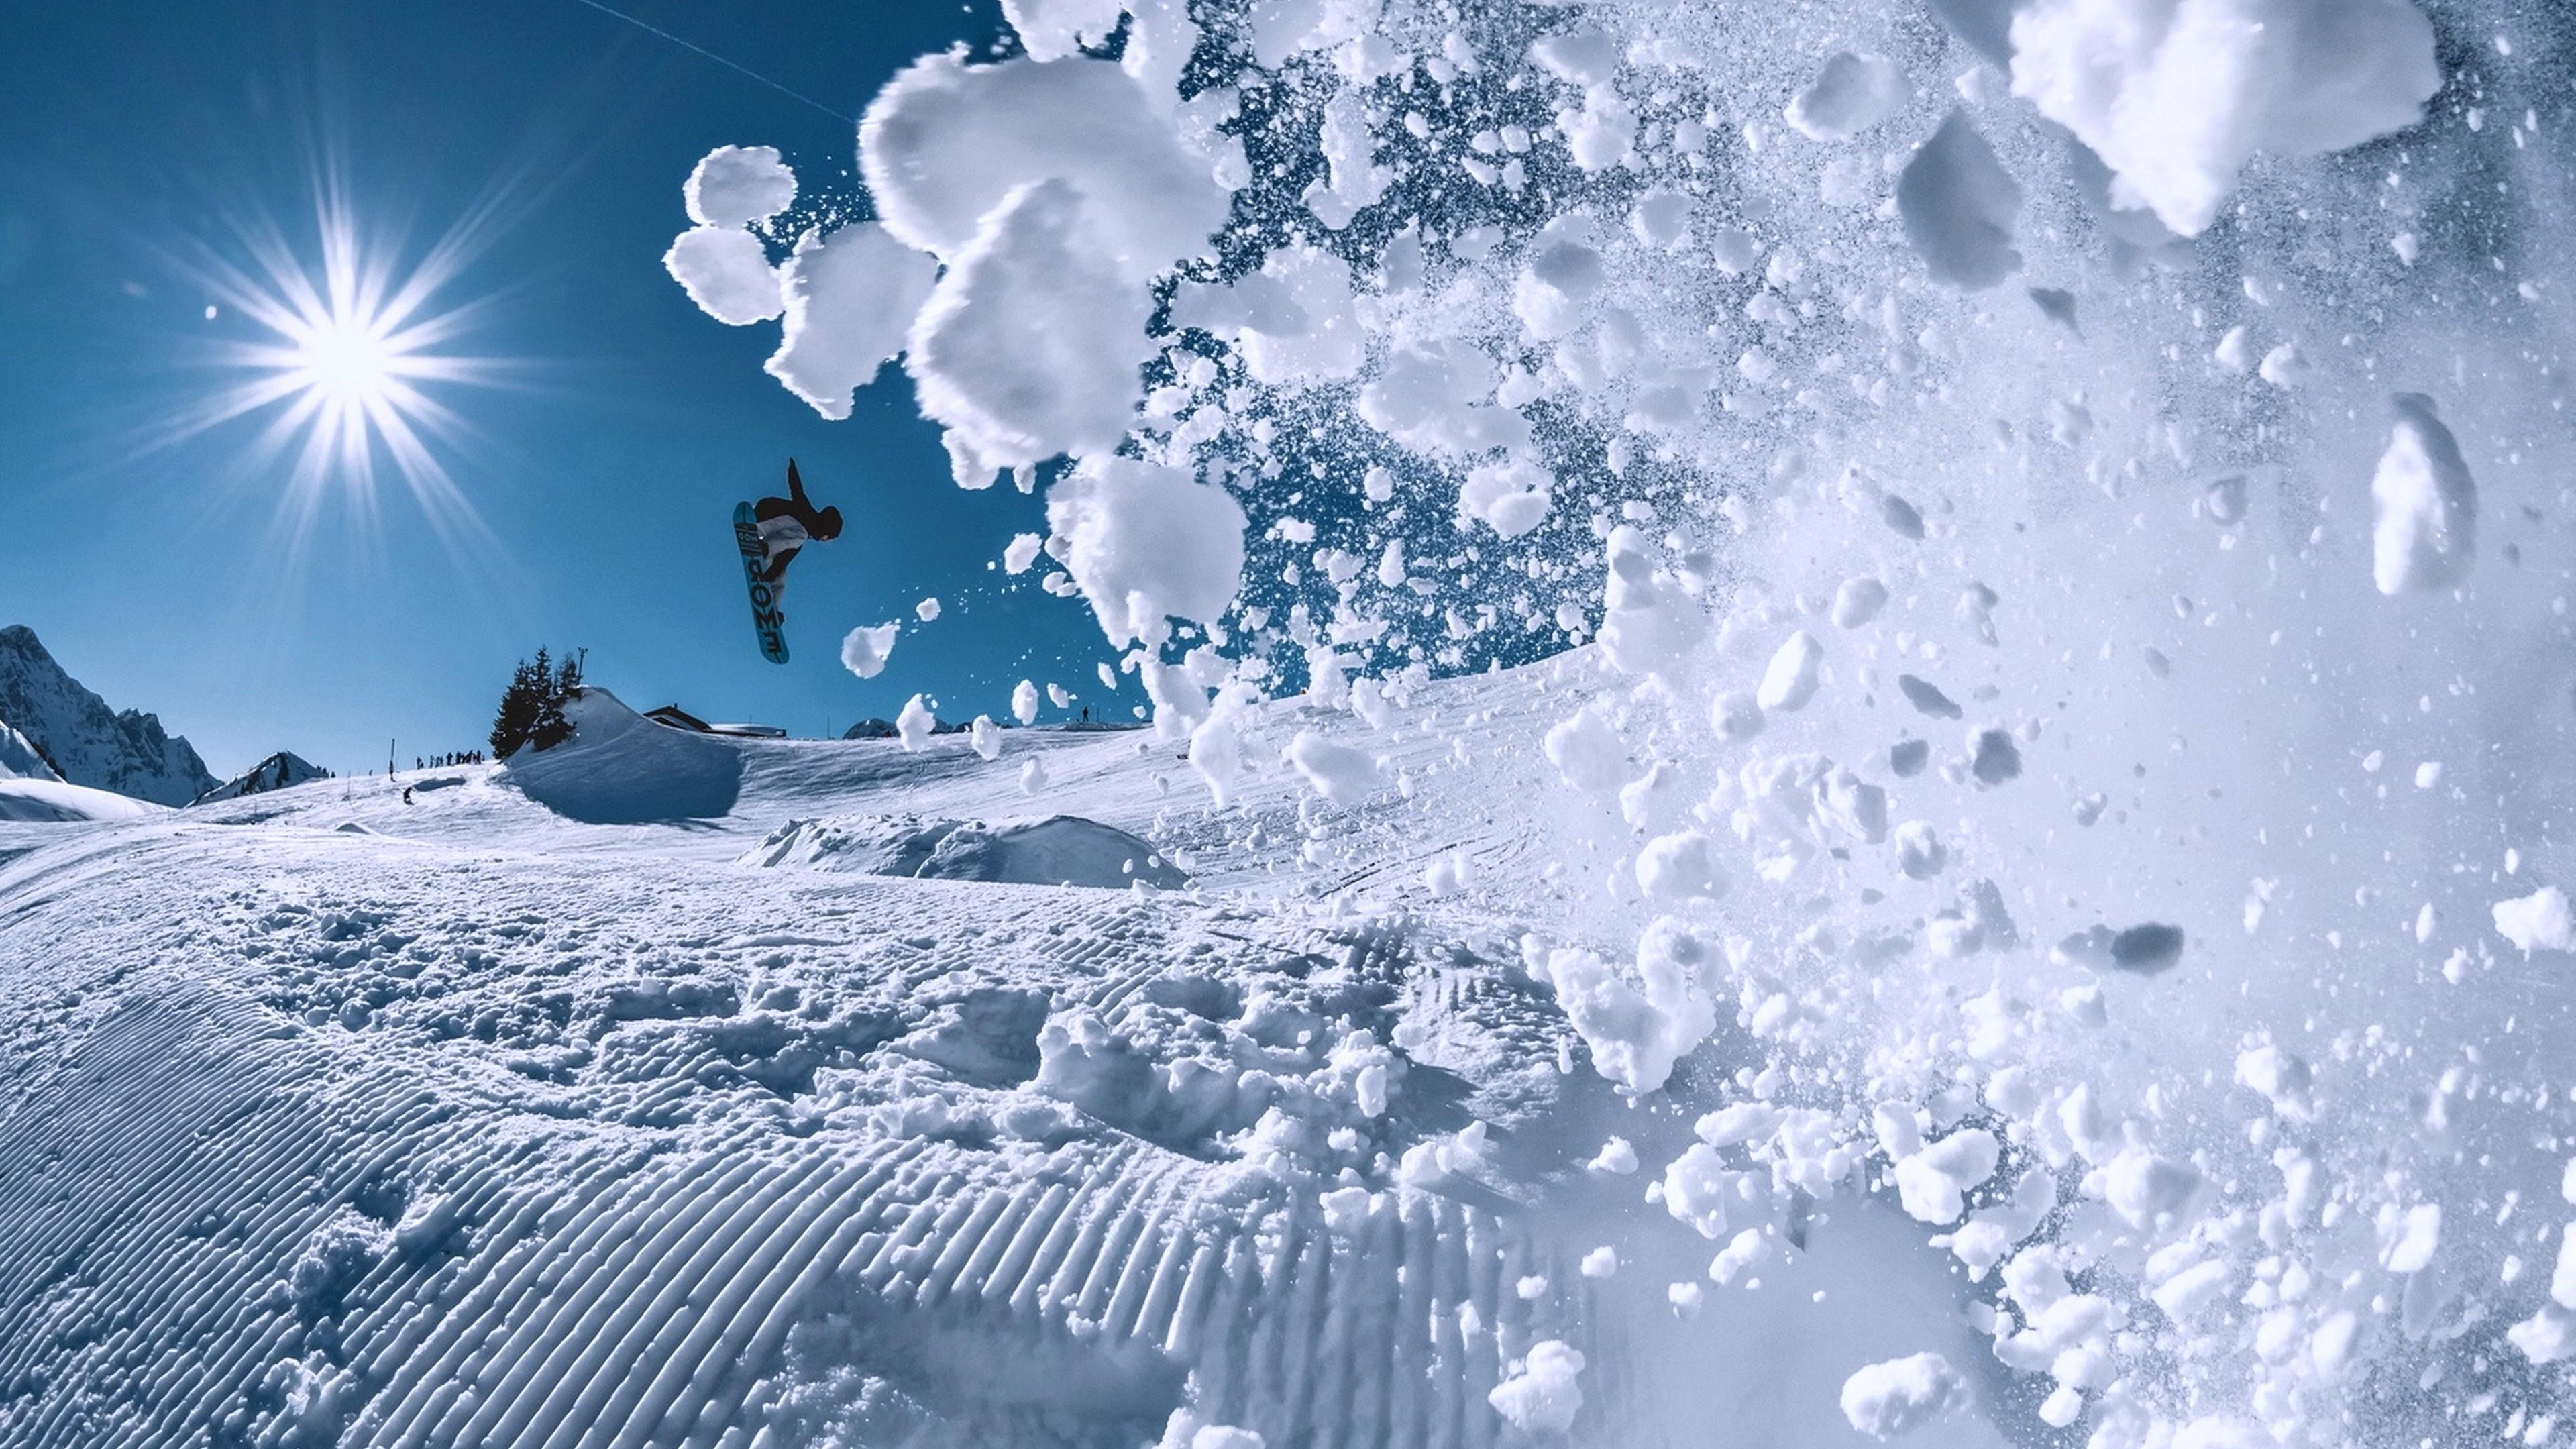 Wallpaper Snowboarding Winter Snow 4k Sport 17399 Page 4